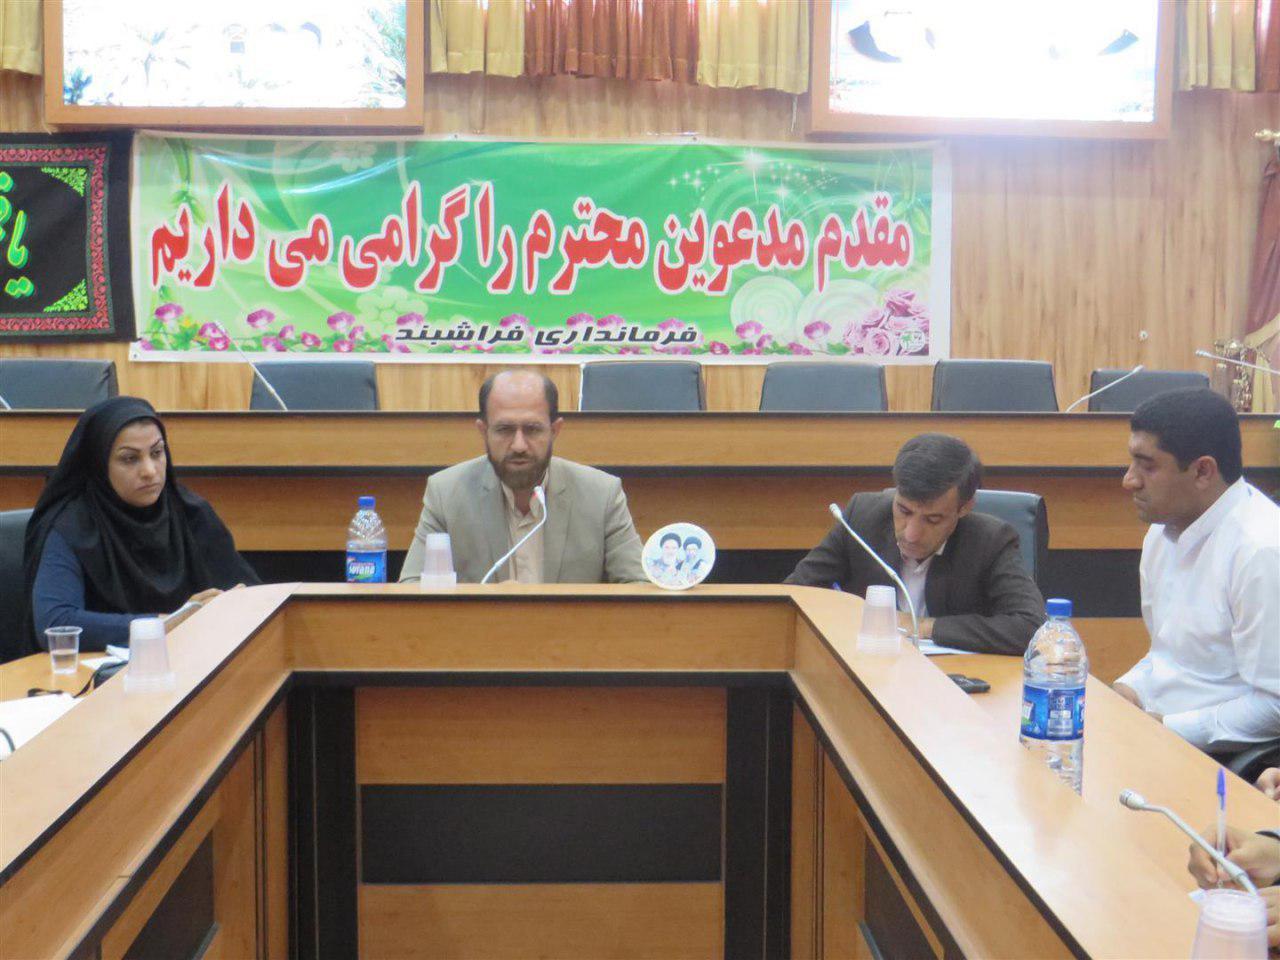 photo_2017-11-05_00-36-05 اعطای تسهیلات 4 درصد در قالب مشاغل خانگی در شهرستان فراشبند